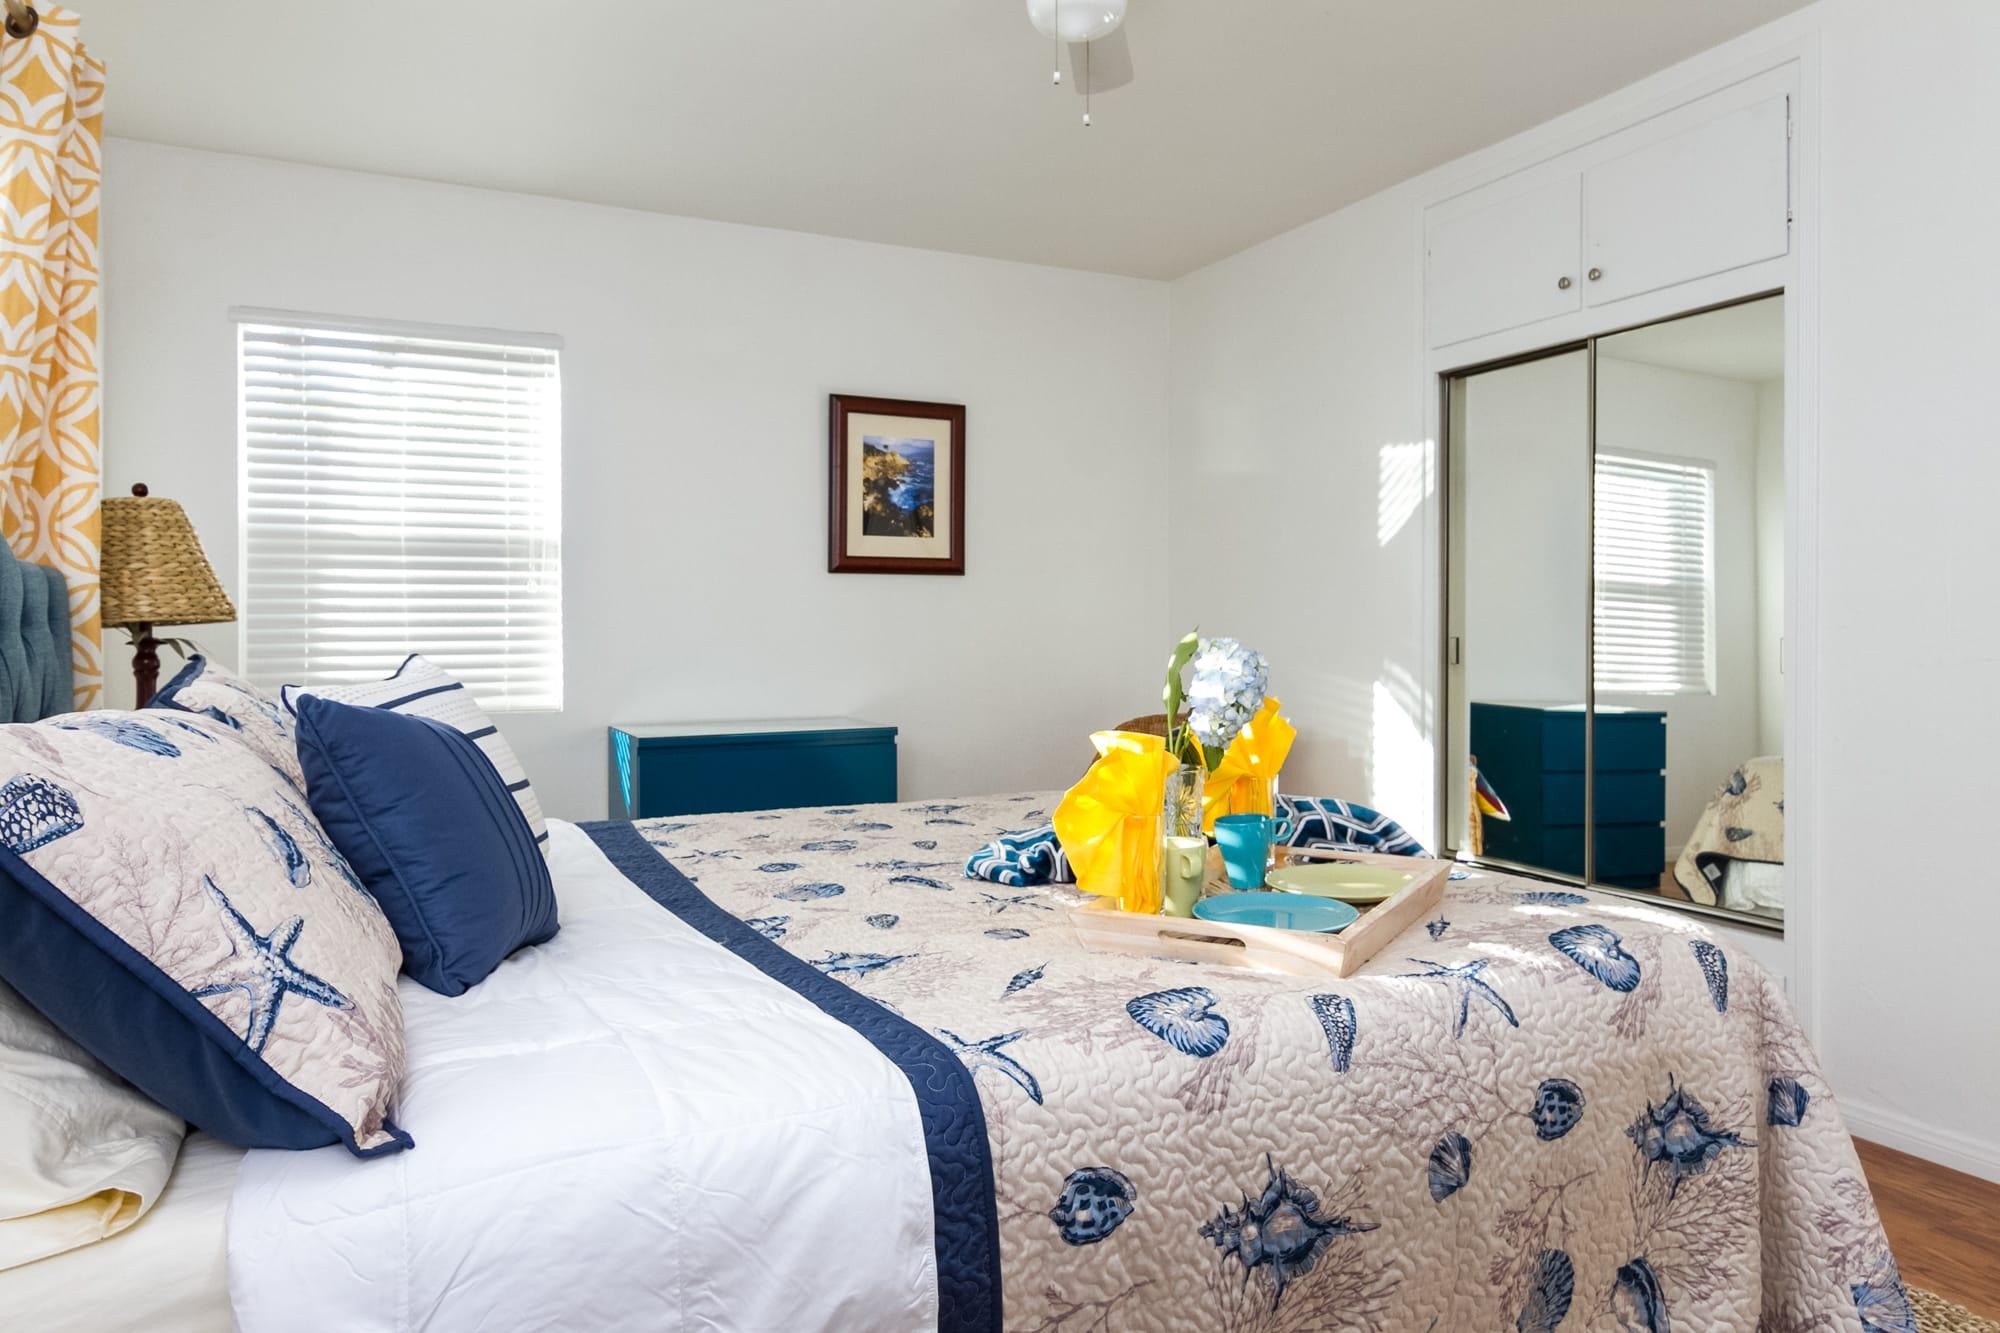 Bedroom 1 | Linens Provided